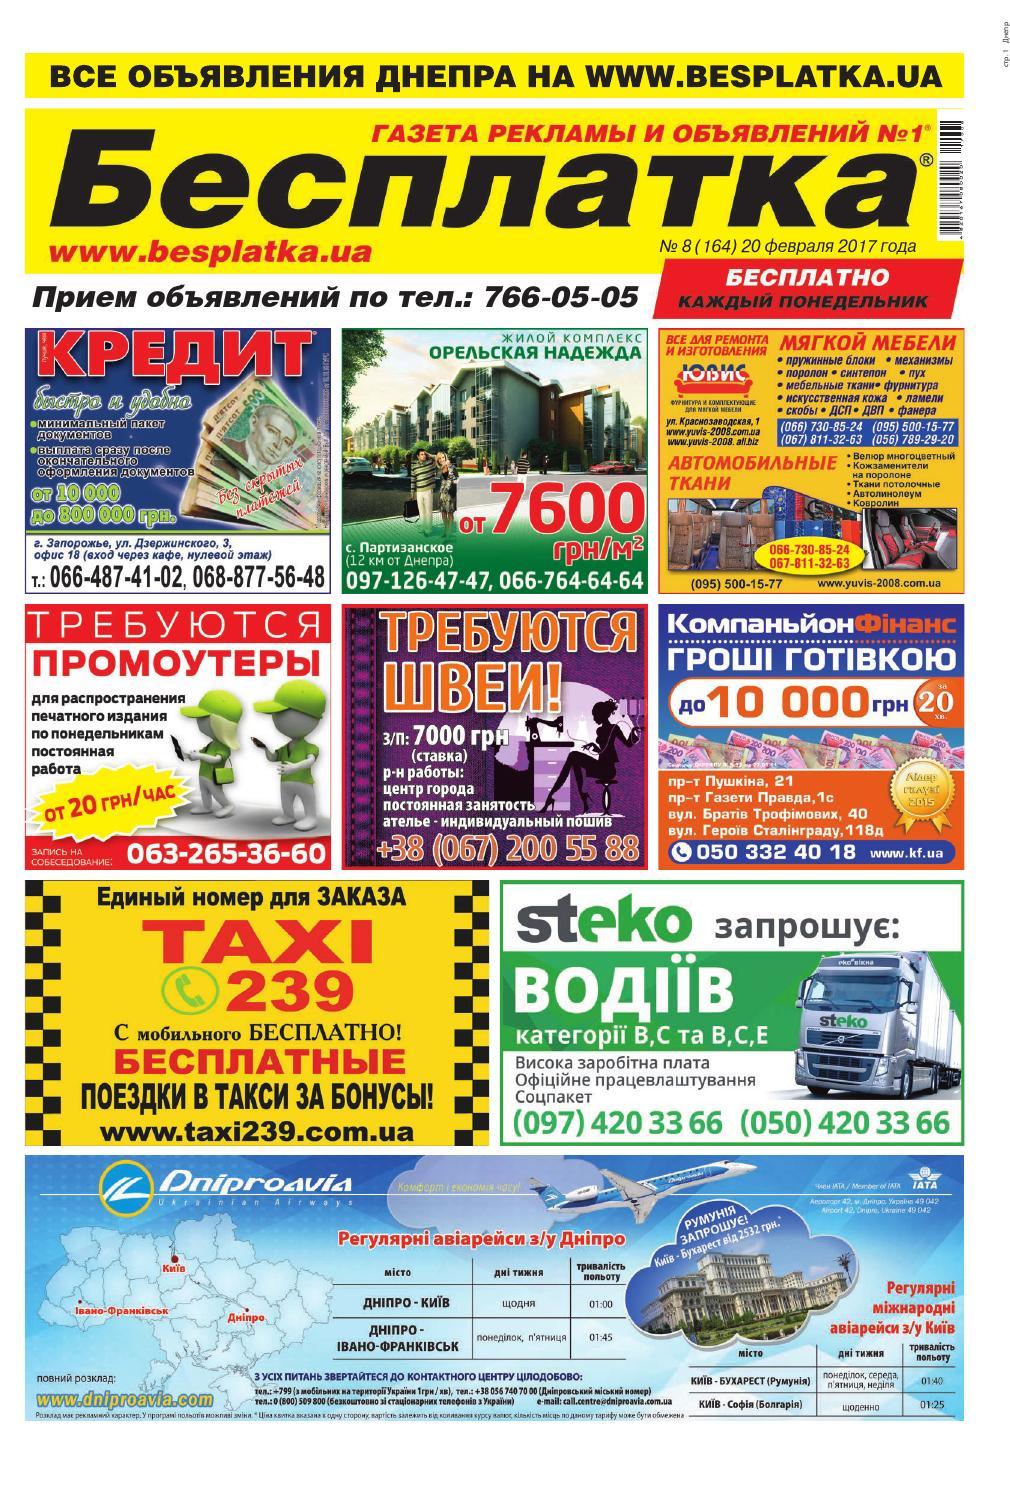 Besplatka  8 Днепр by besplatka ukraine - issuu 88120bb00cc